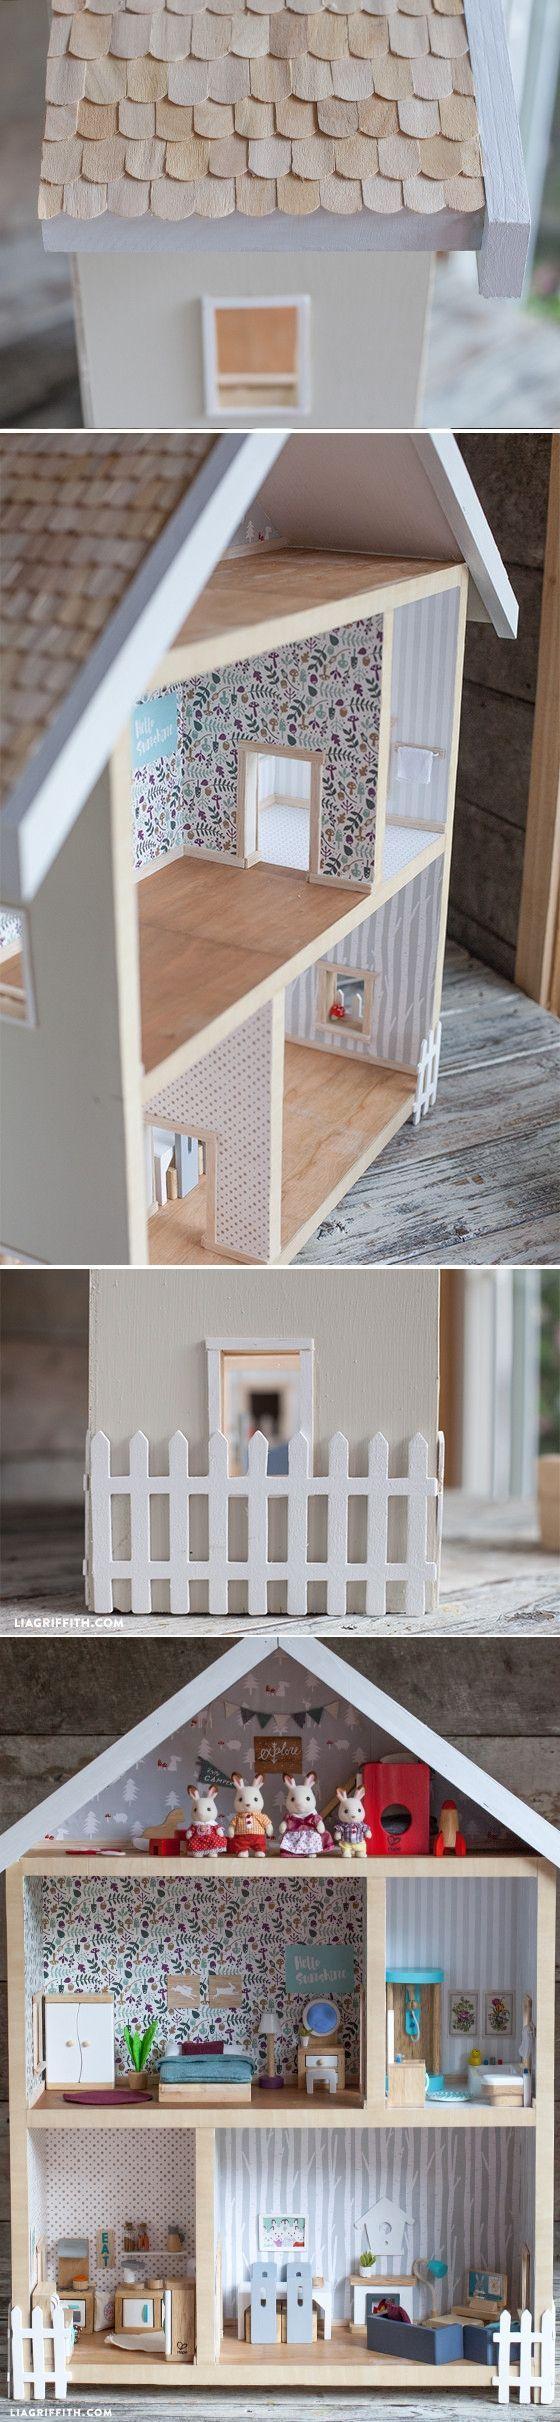 DIY doll house -tejas para aprovechar recortes de madera